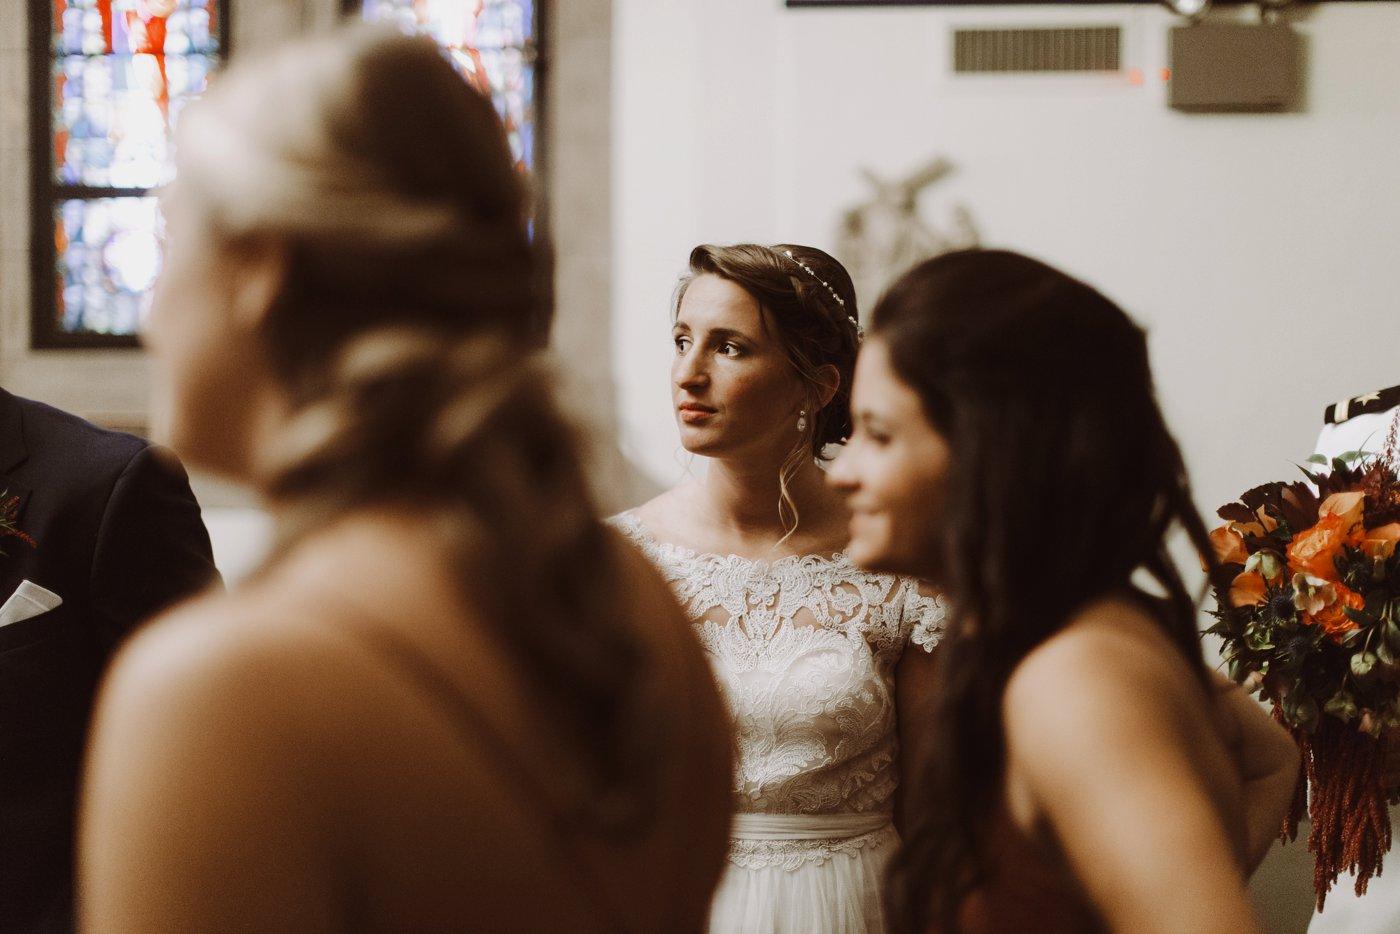 Downtown Annapolis USNA wedding Annapolis Maryland wedding photographer Kate Ann Photography